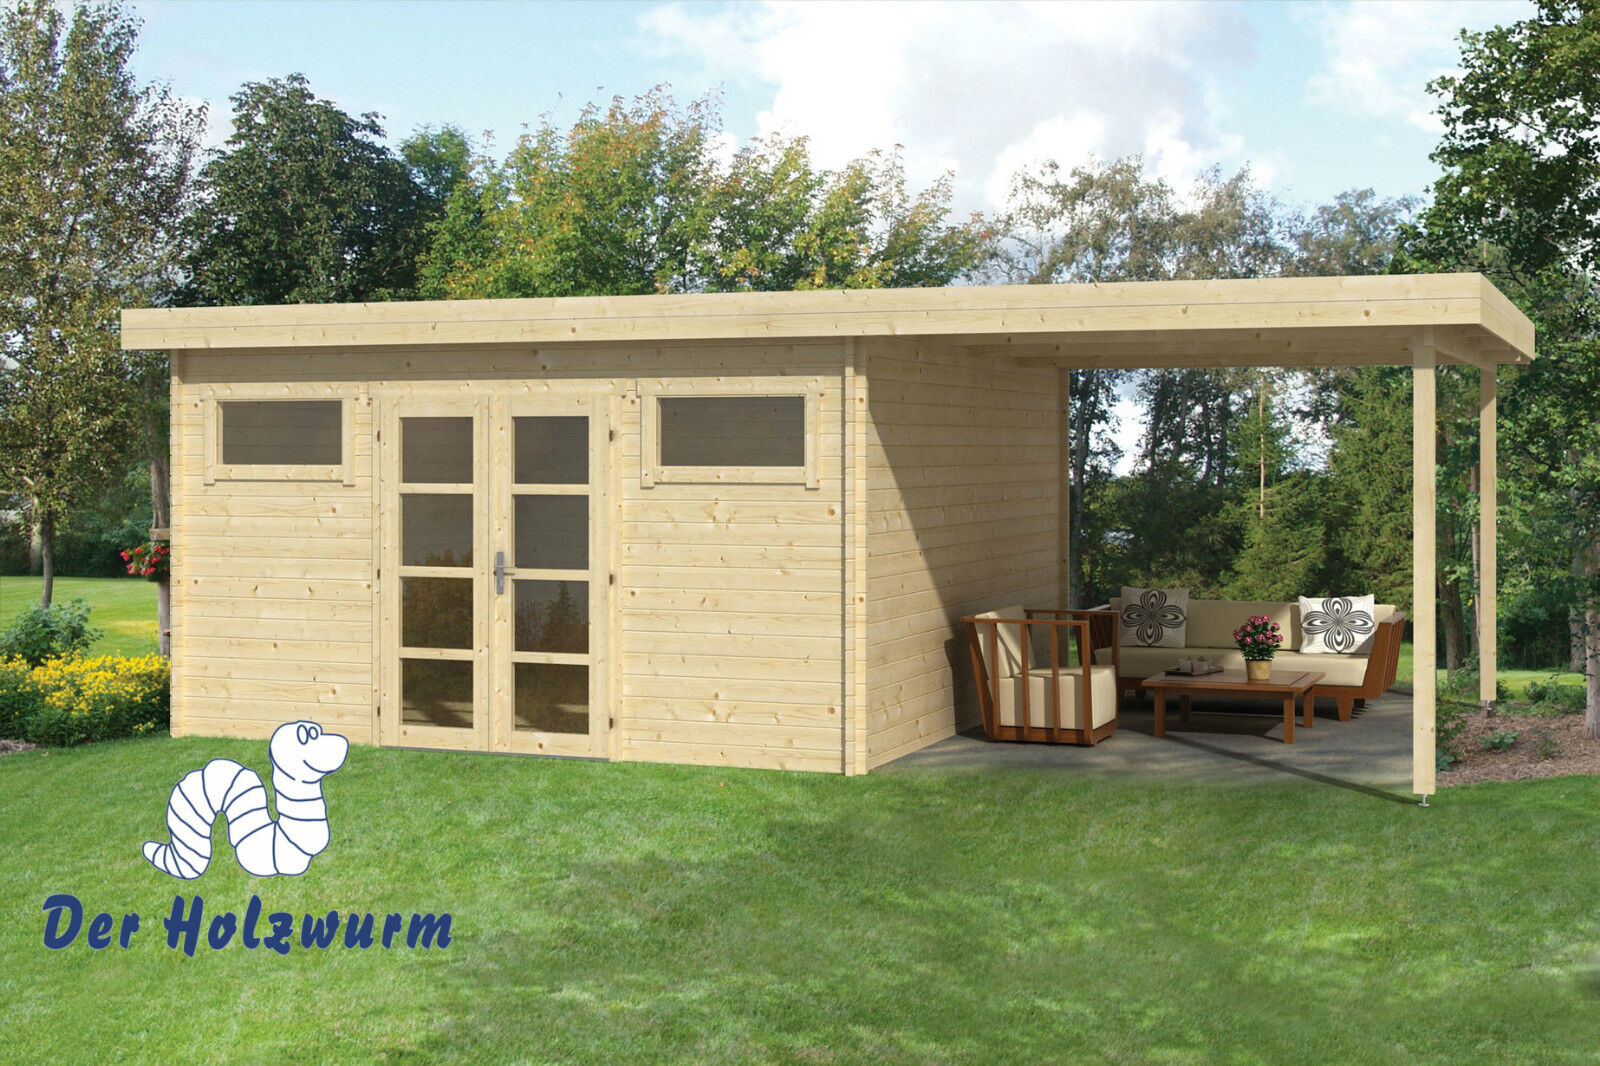 40 mm gartenhaus blockhaus 690x420cm holzhaus unterstand holz anbau sitzecke ebay. Black Bedroom Furniture Sets. Home Design Ideas